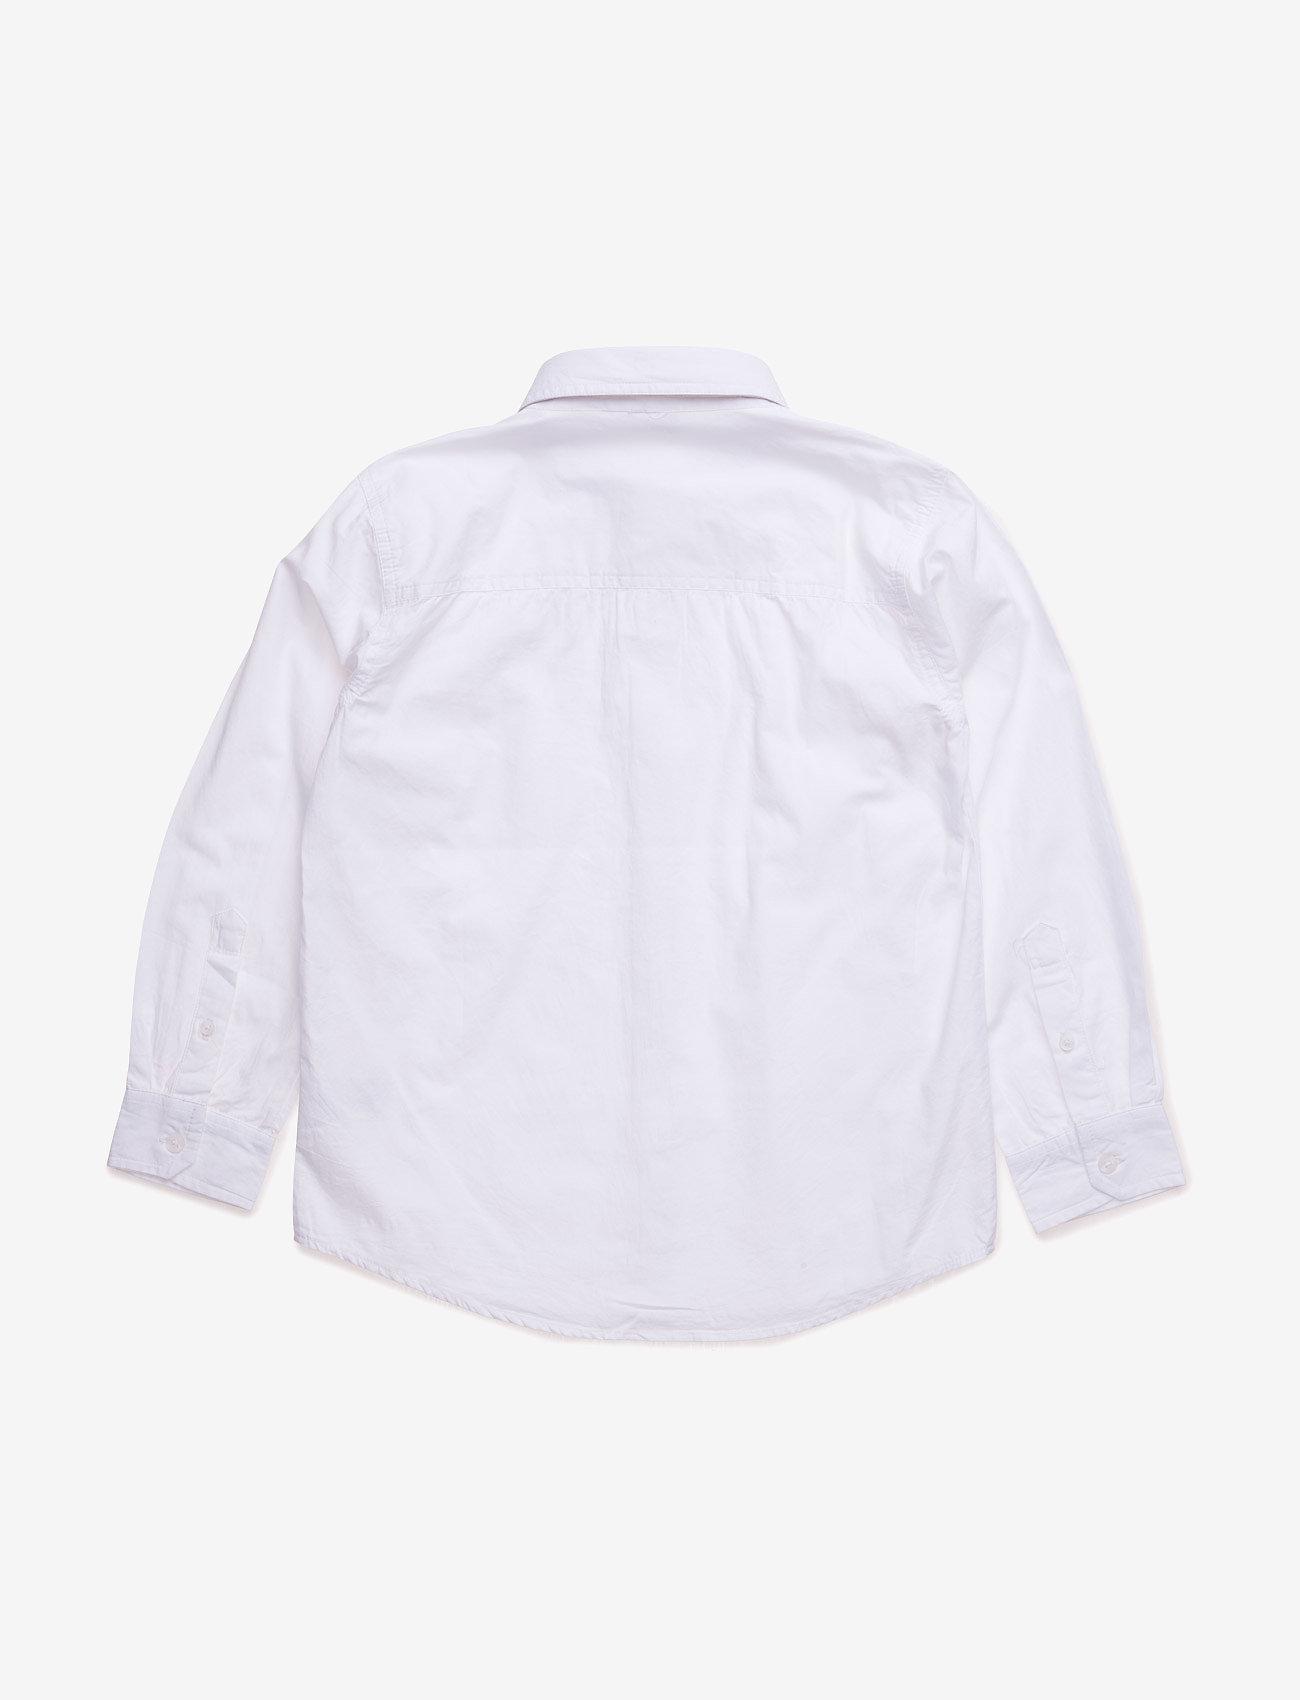 Hust & Claire - Shirt - shirts - white - 1